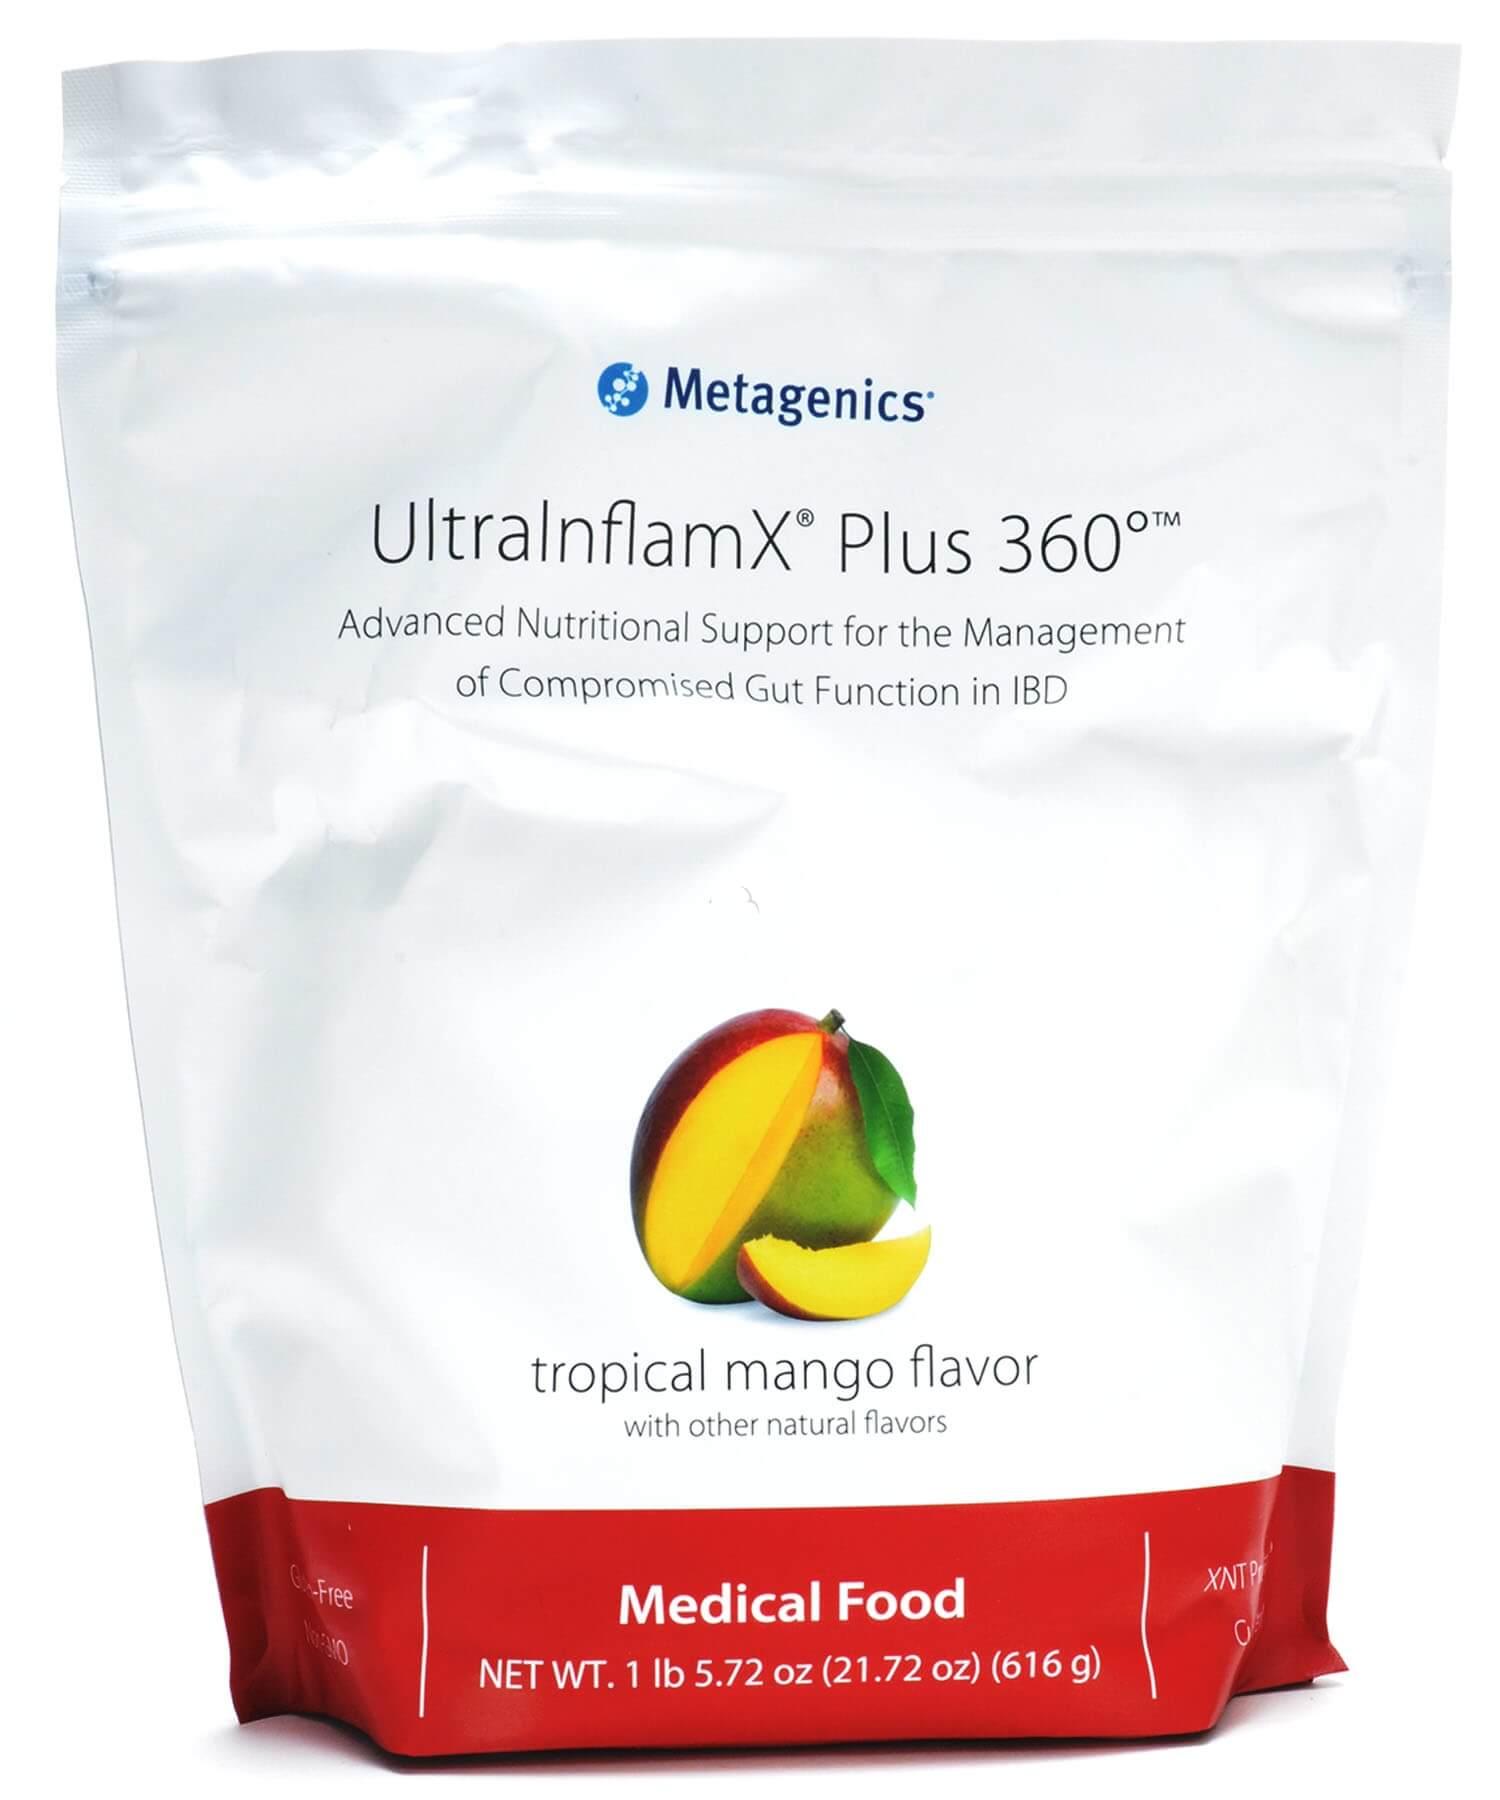 Metagenics Ultrainflamx 360 Plus | Mango Flavour